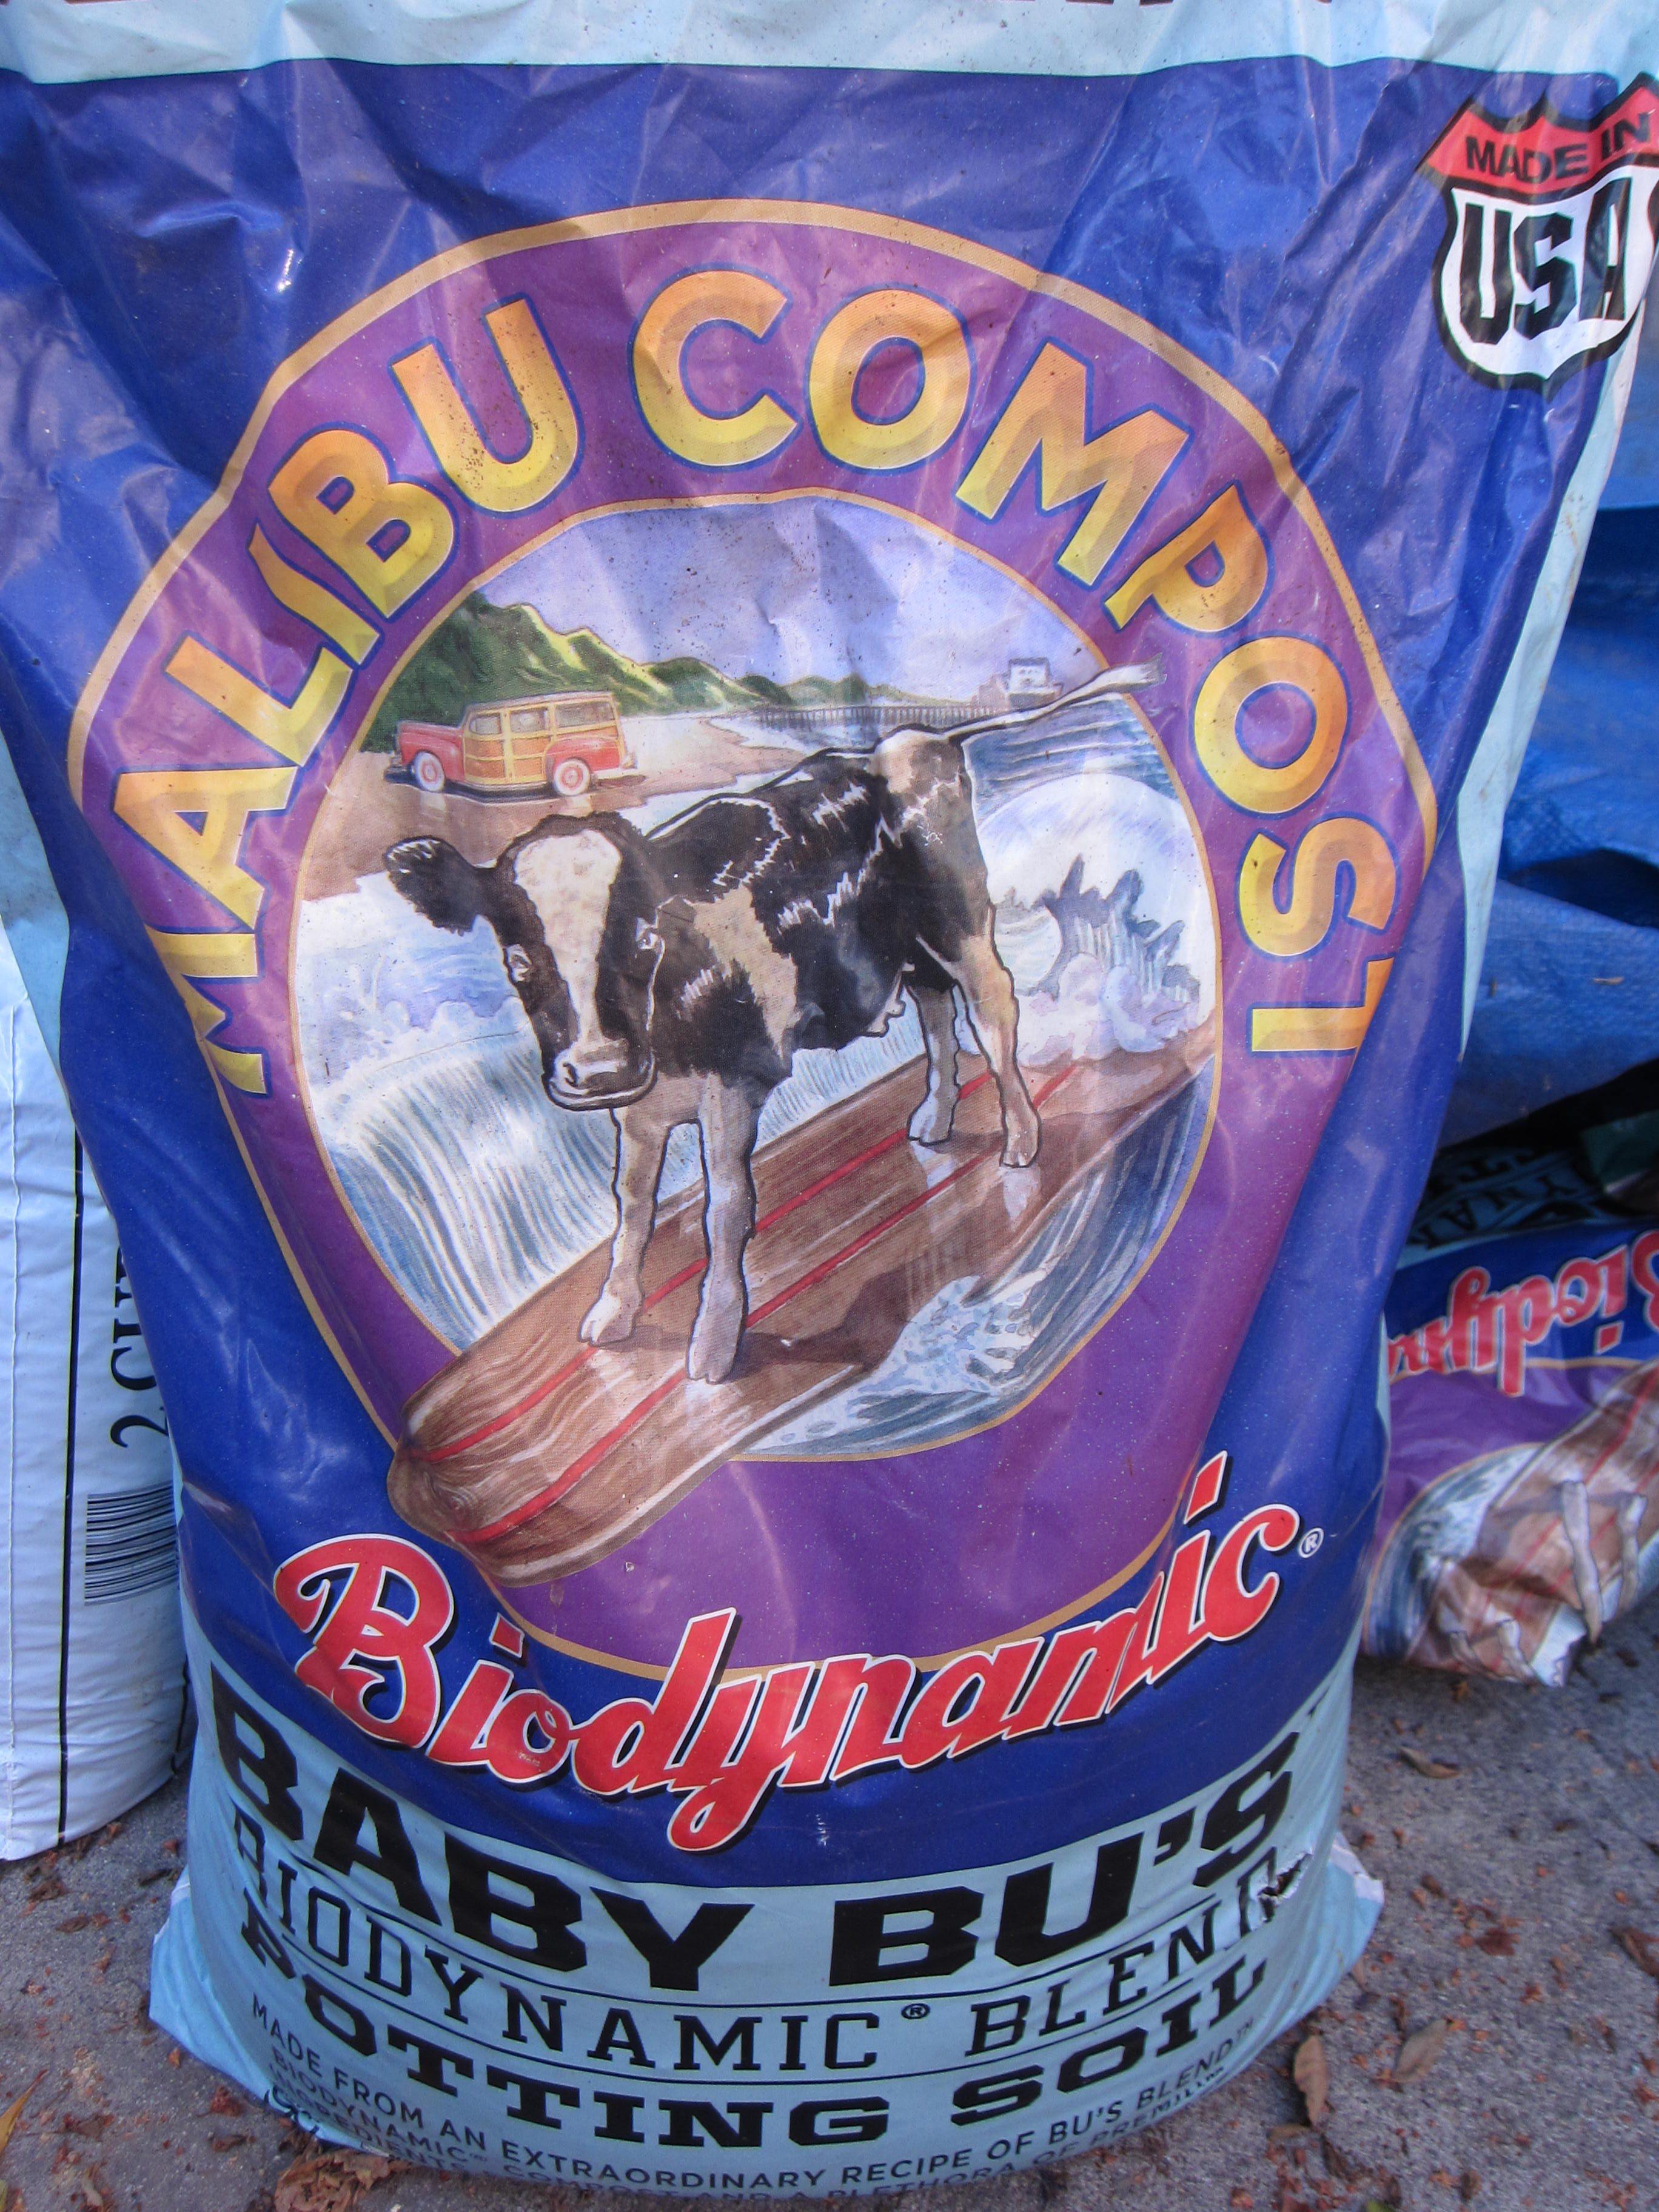 Malibu Compost soil